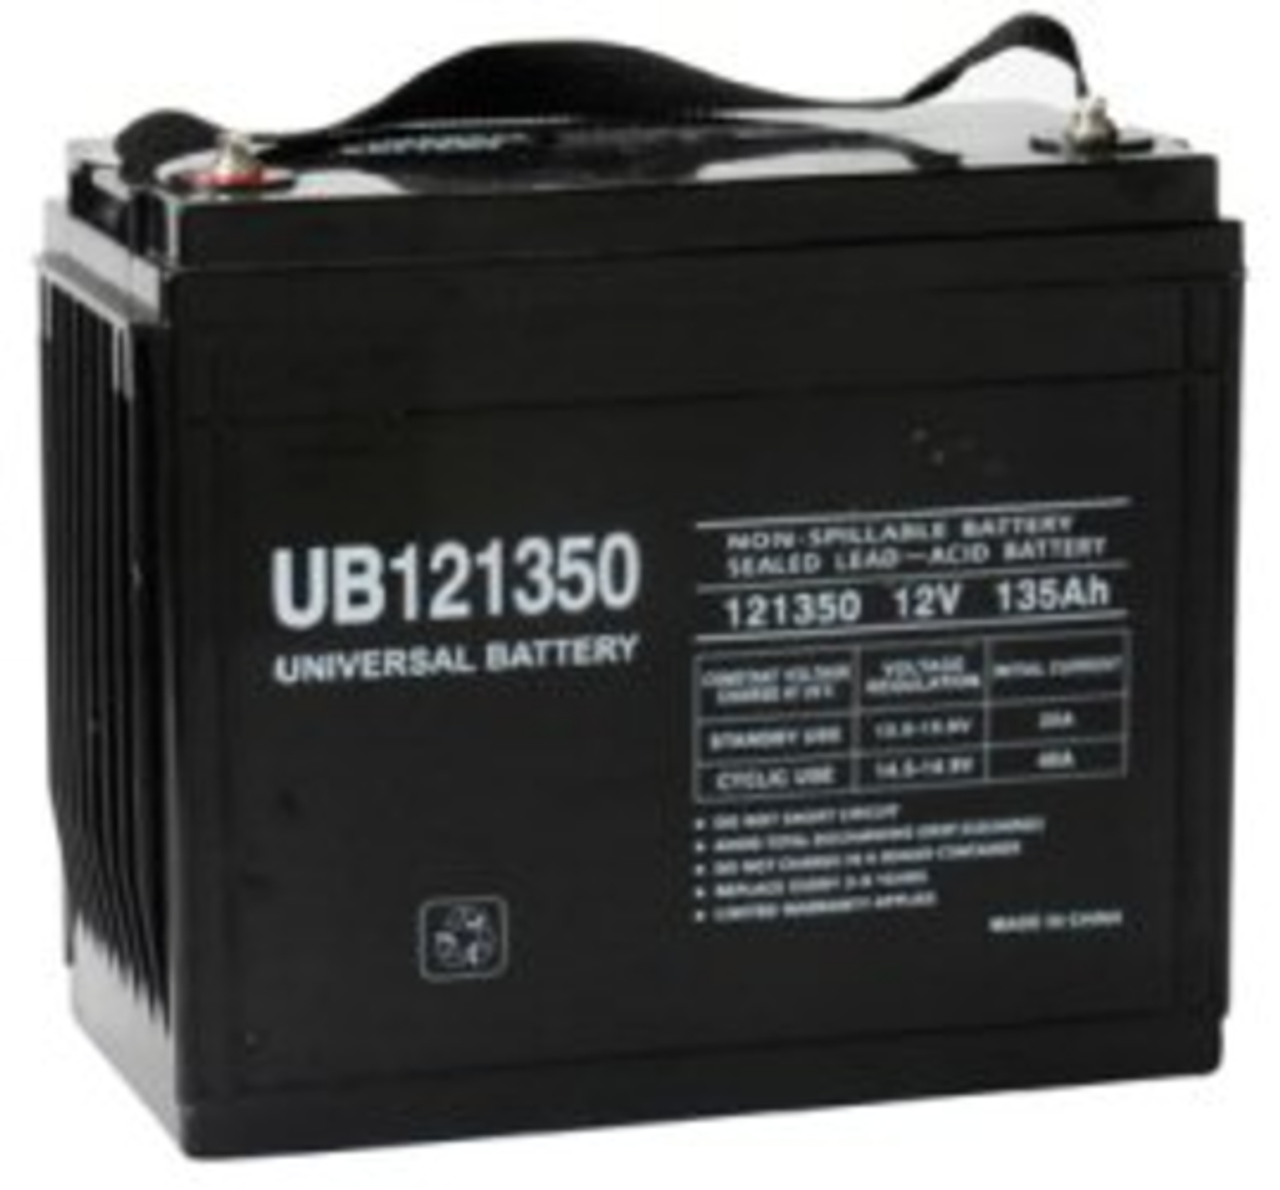 Universal Ub121350 12V 135Ah (20Hr) Sealed Agm